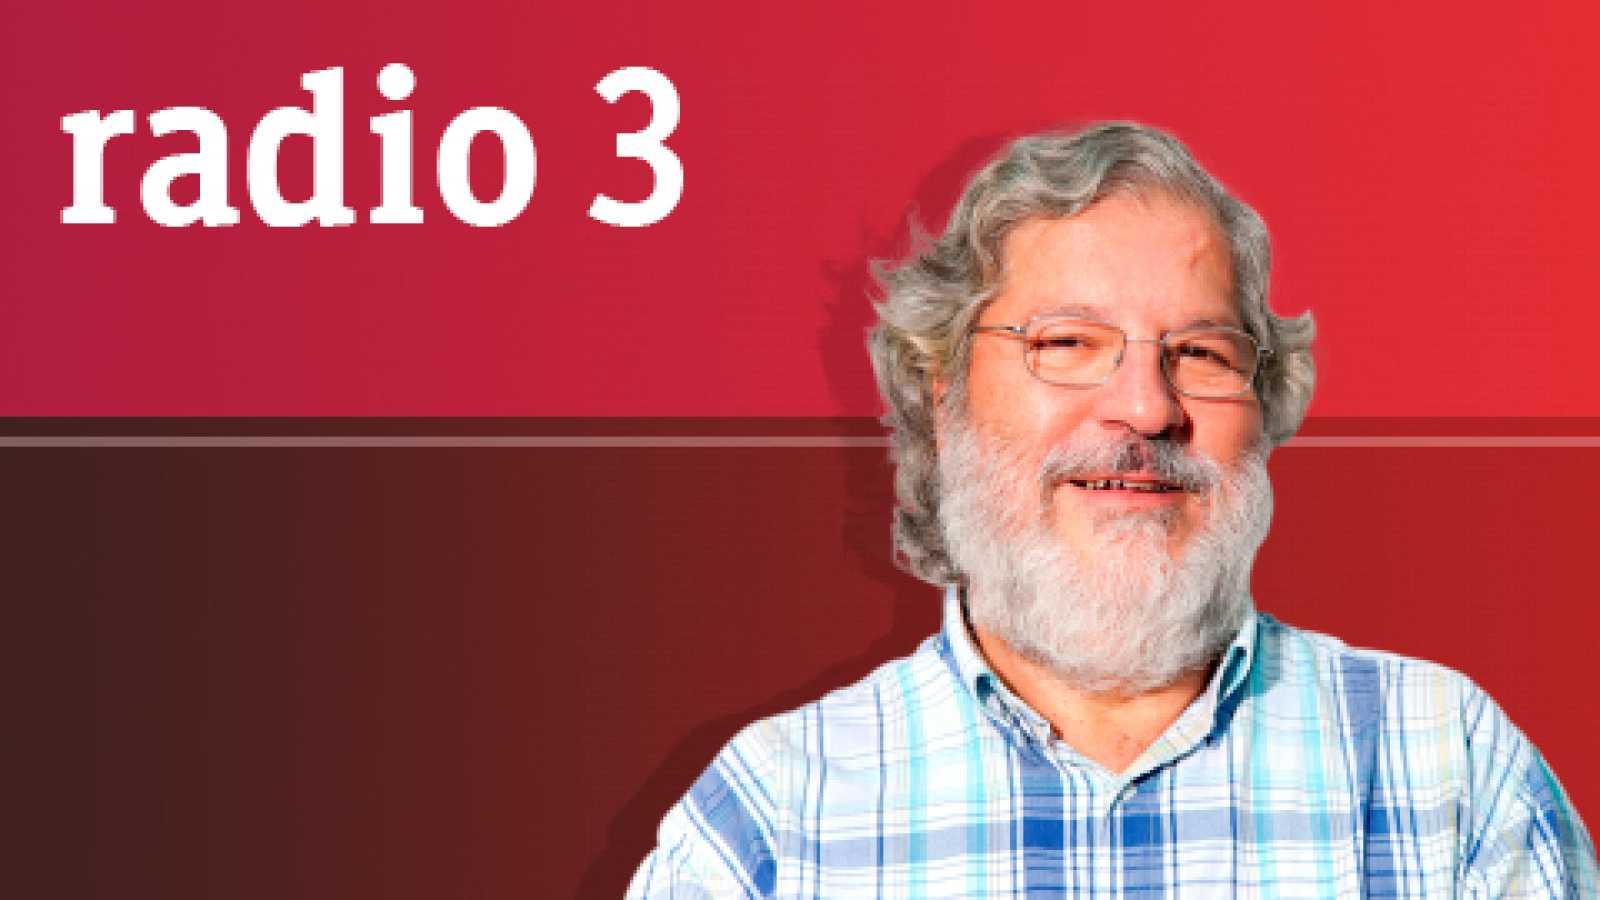 Discópolis - 10.801: Sesiones tesoro RNE 09 Formula V - Massiel - 23/12/19 - escuchar ahora